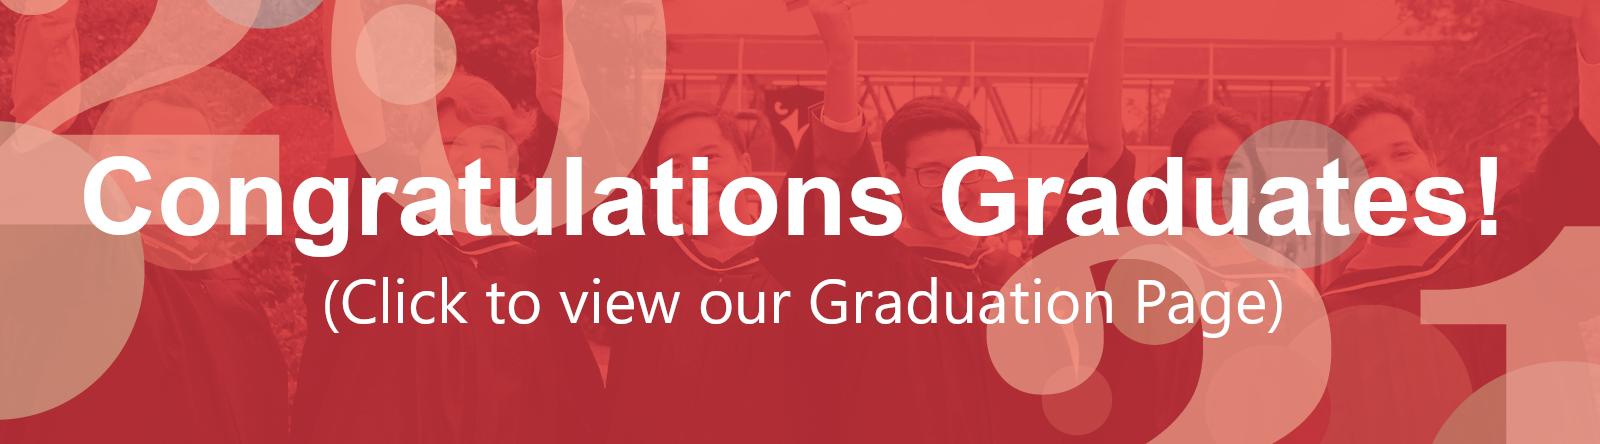 Congratulations Graduates! (click to view our graduation page)